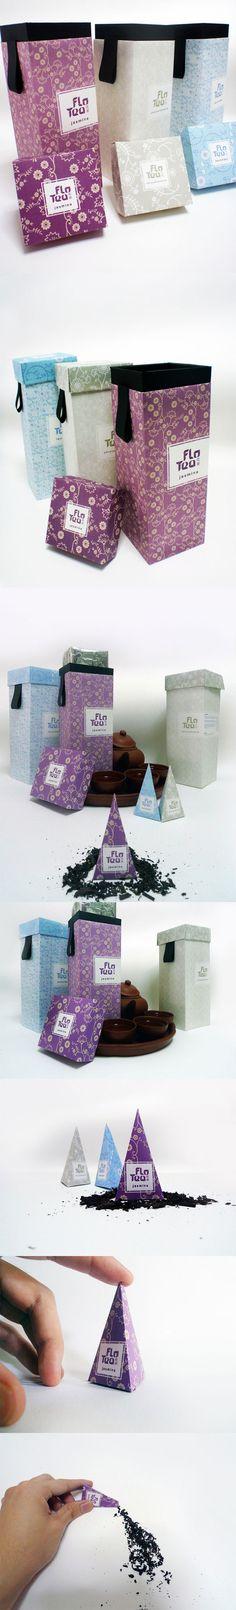 Unique Packaging Design, Flo Tea #packaging #design (http://www.pinterest.com/aldenchong/)